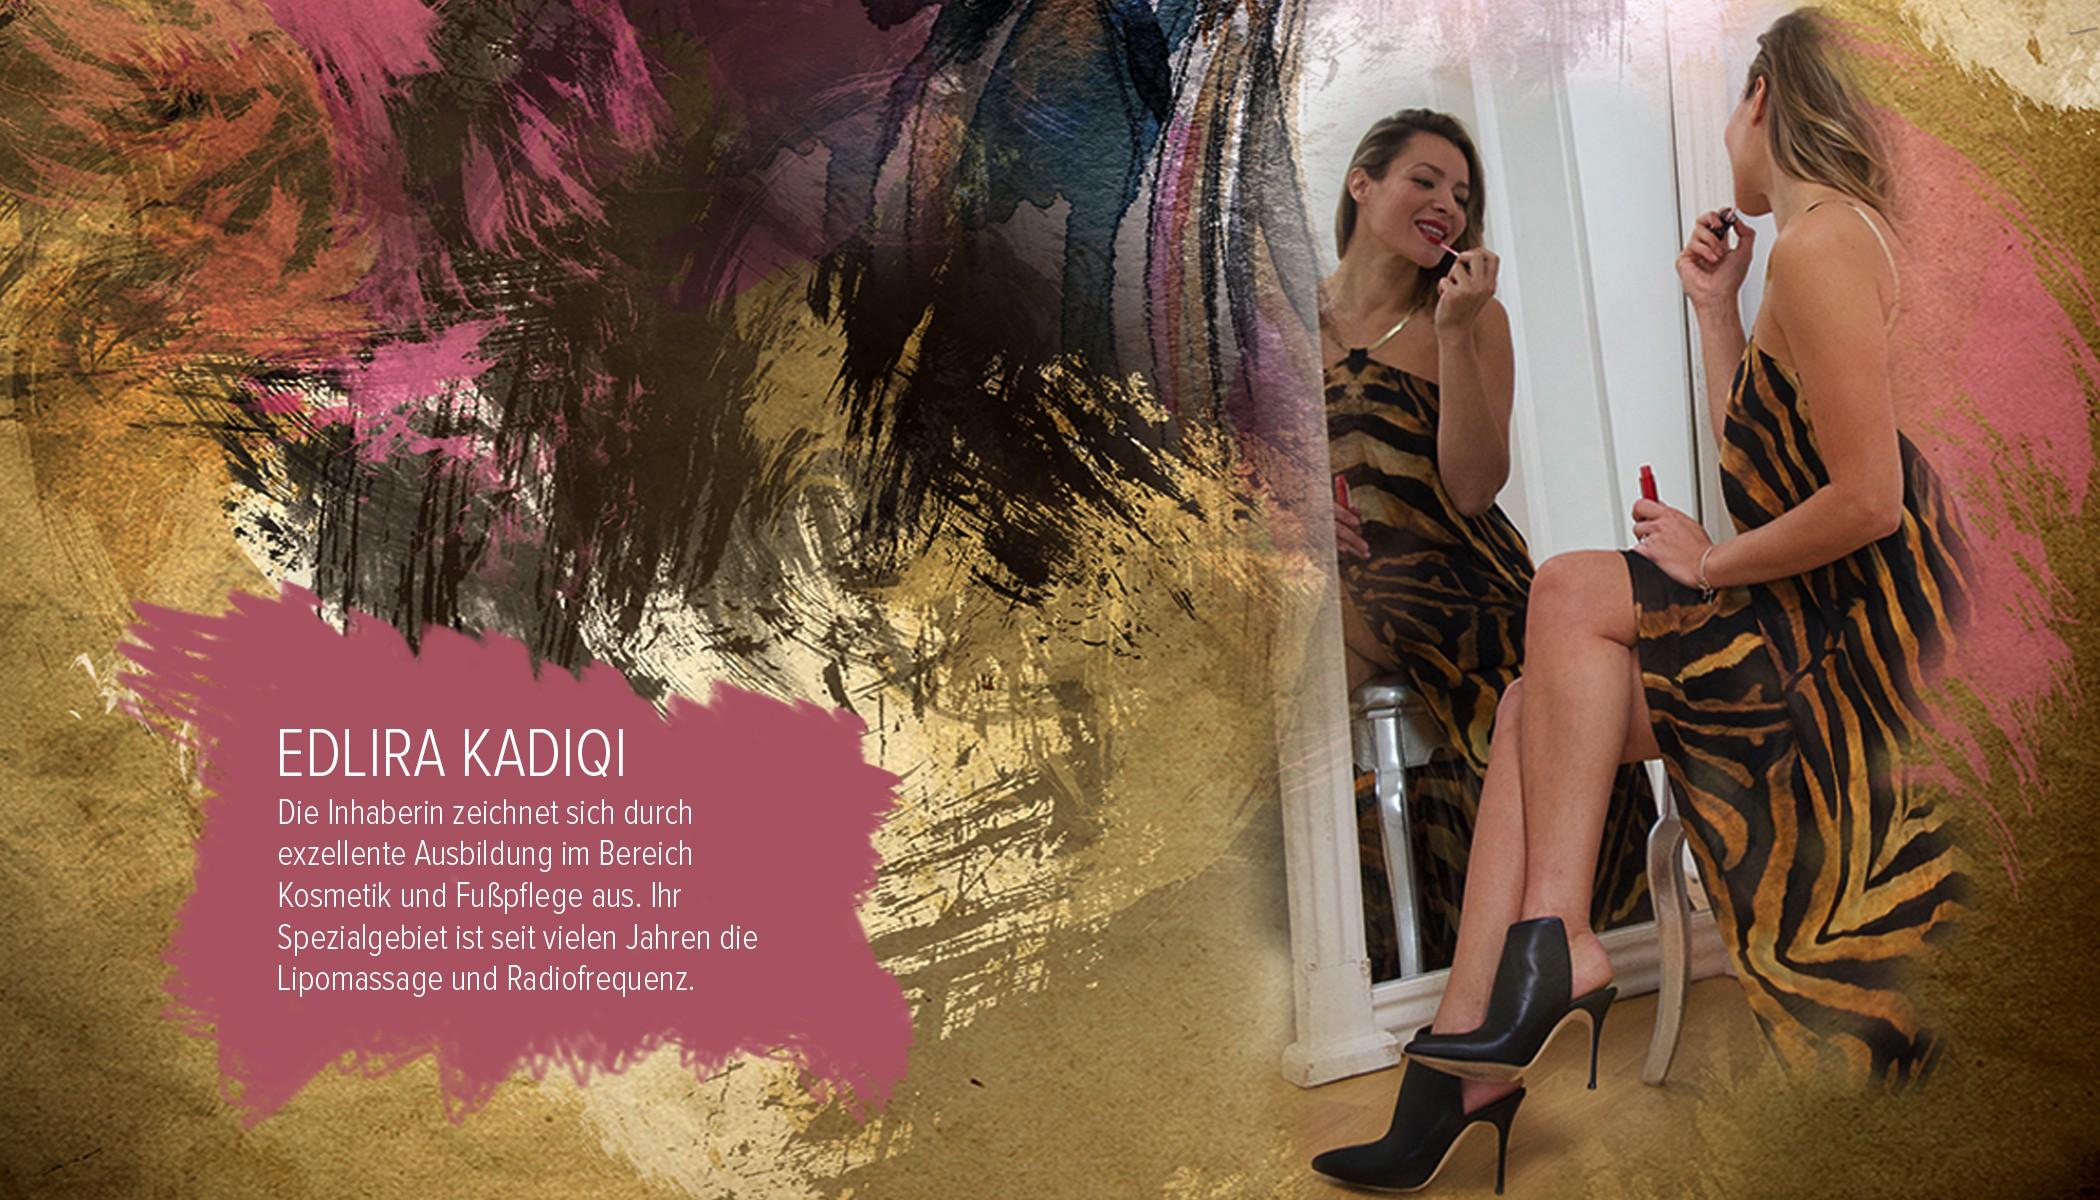 Edlira Kadiqi